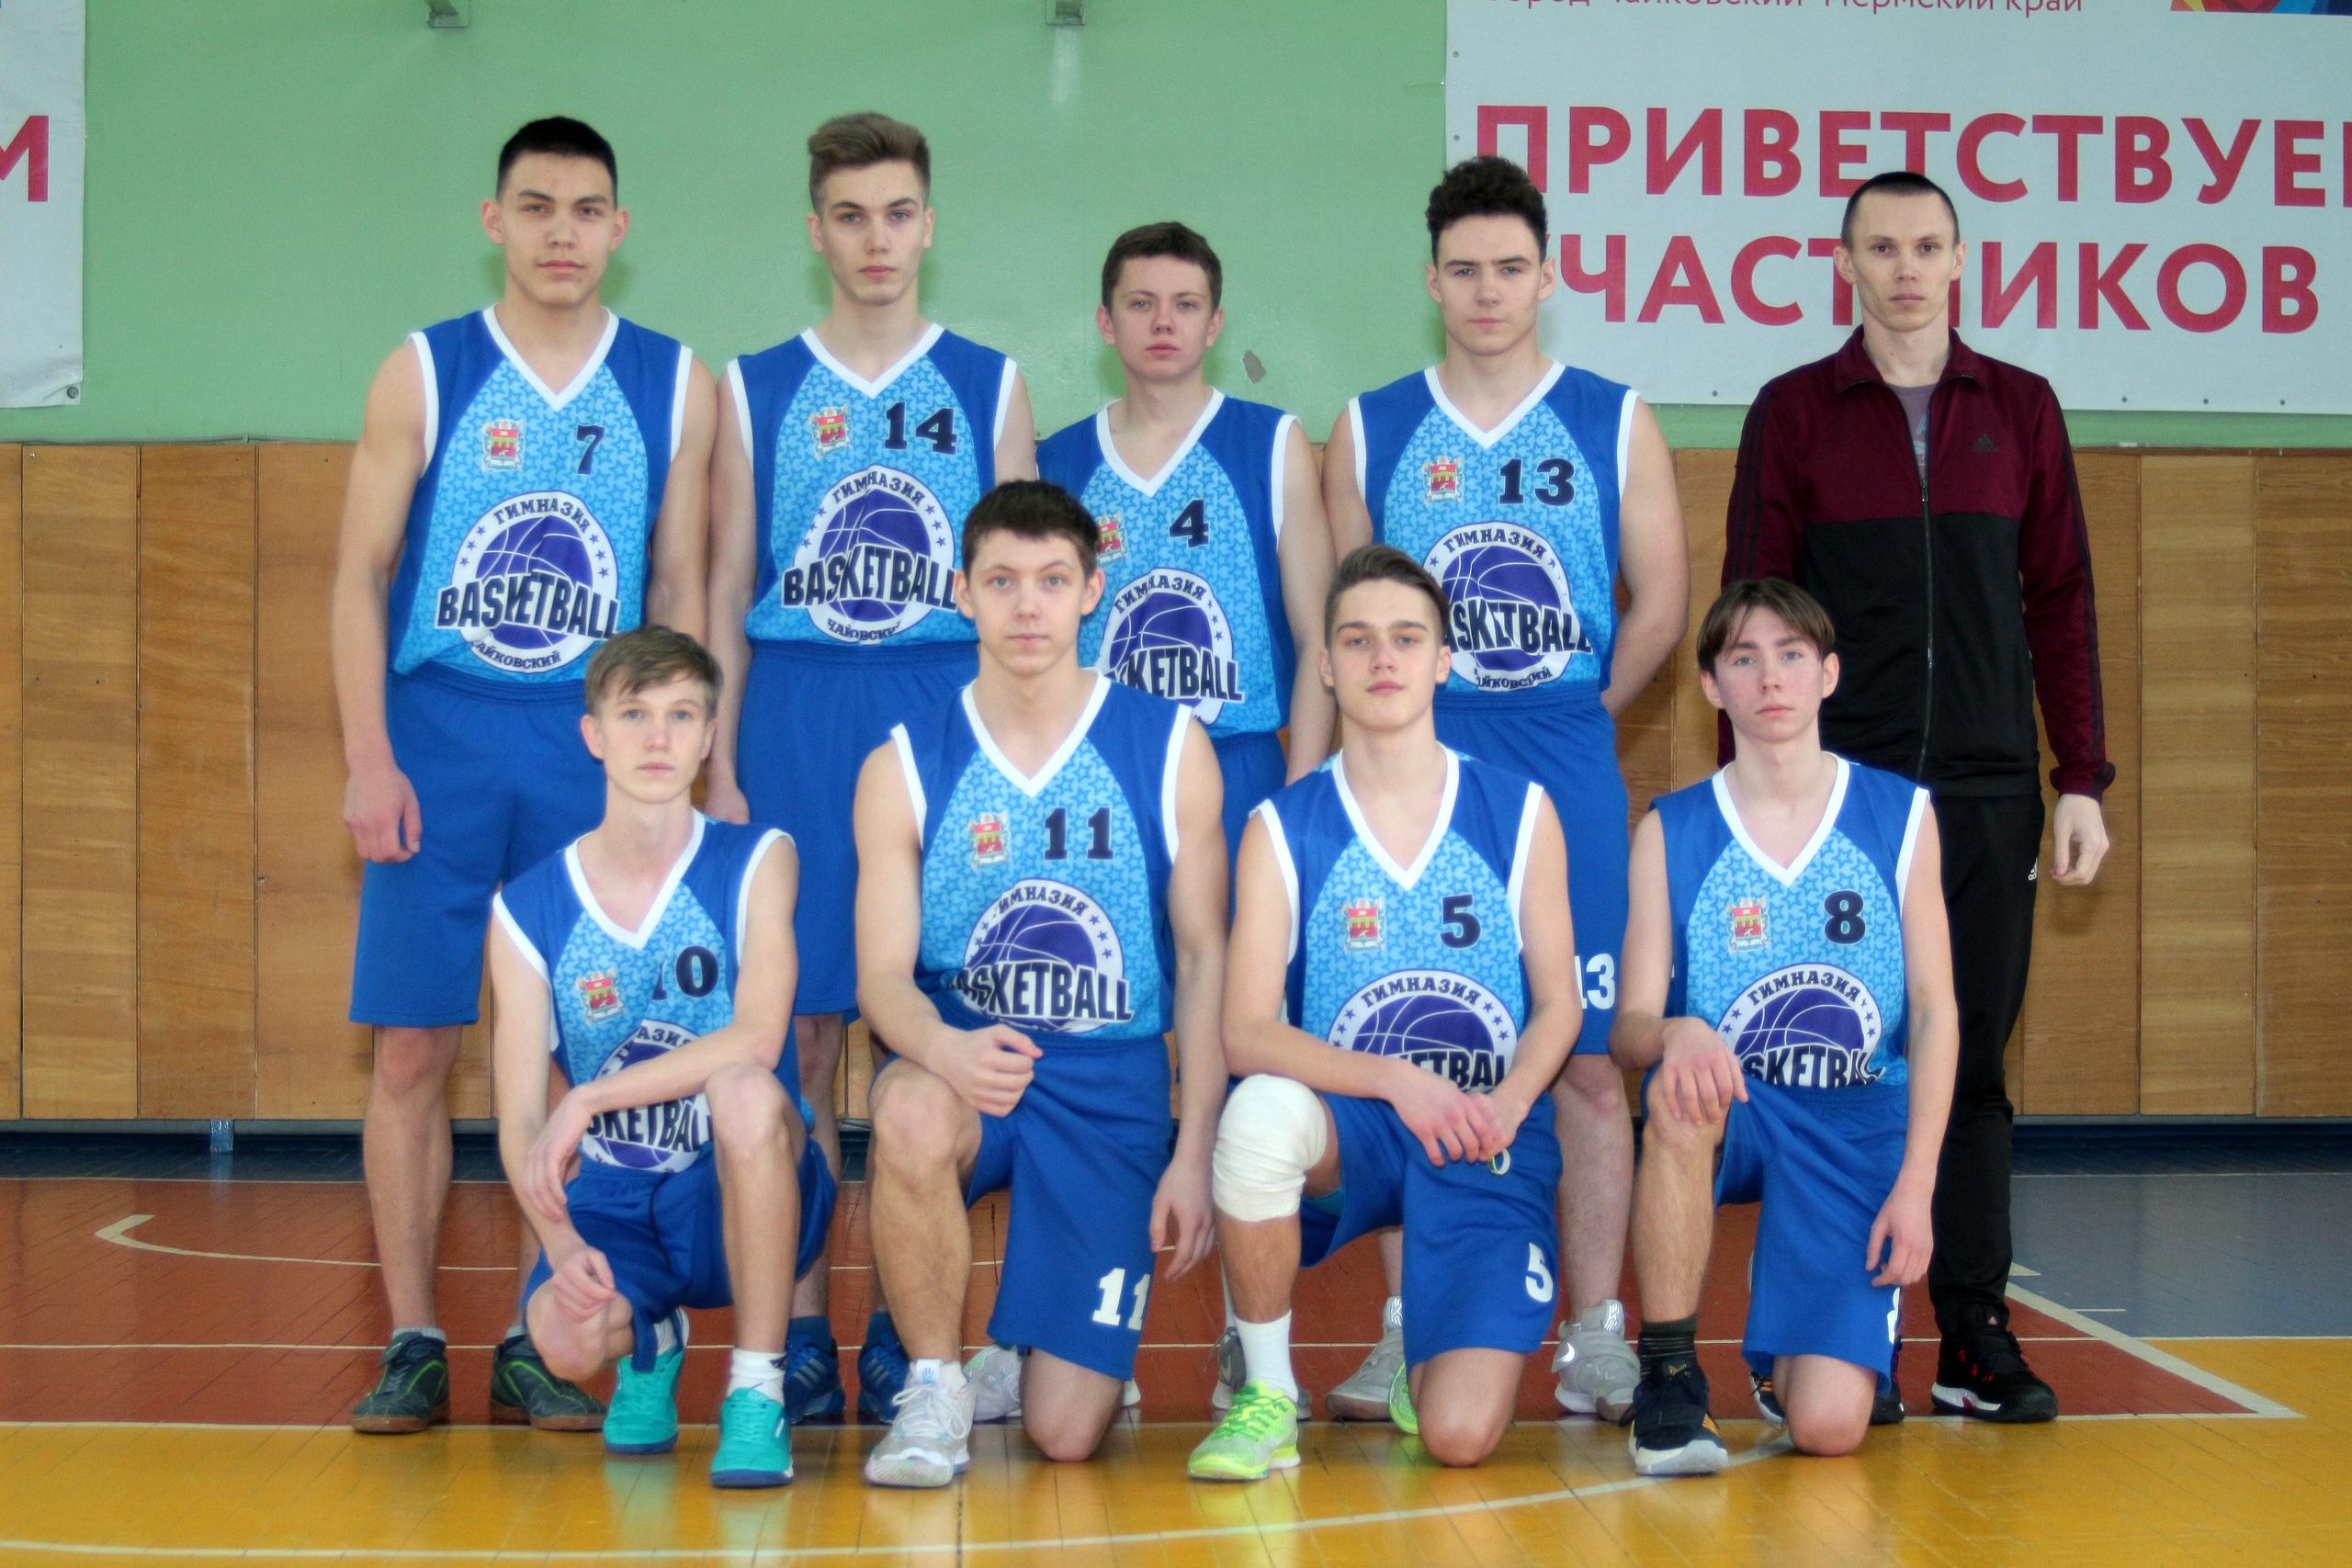 турнир памяти кочкиной, чайковский, баскетбол, 2019 год